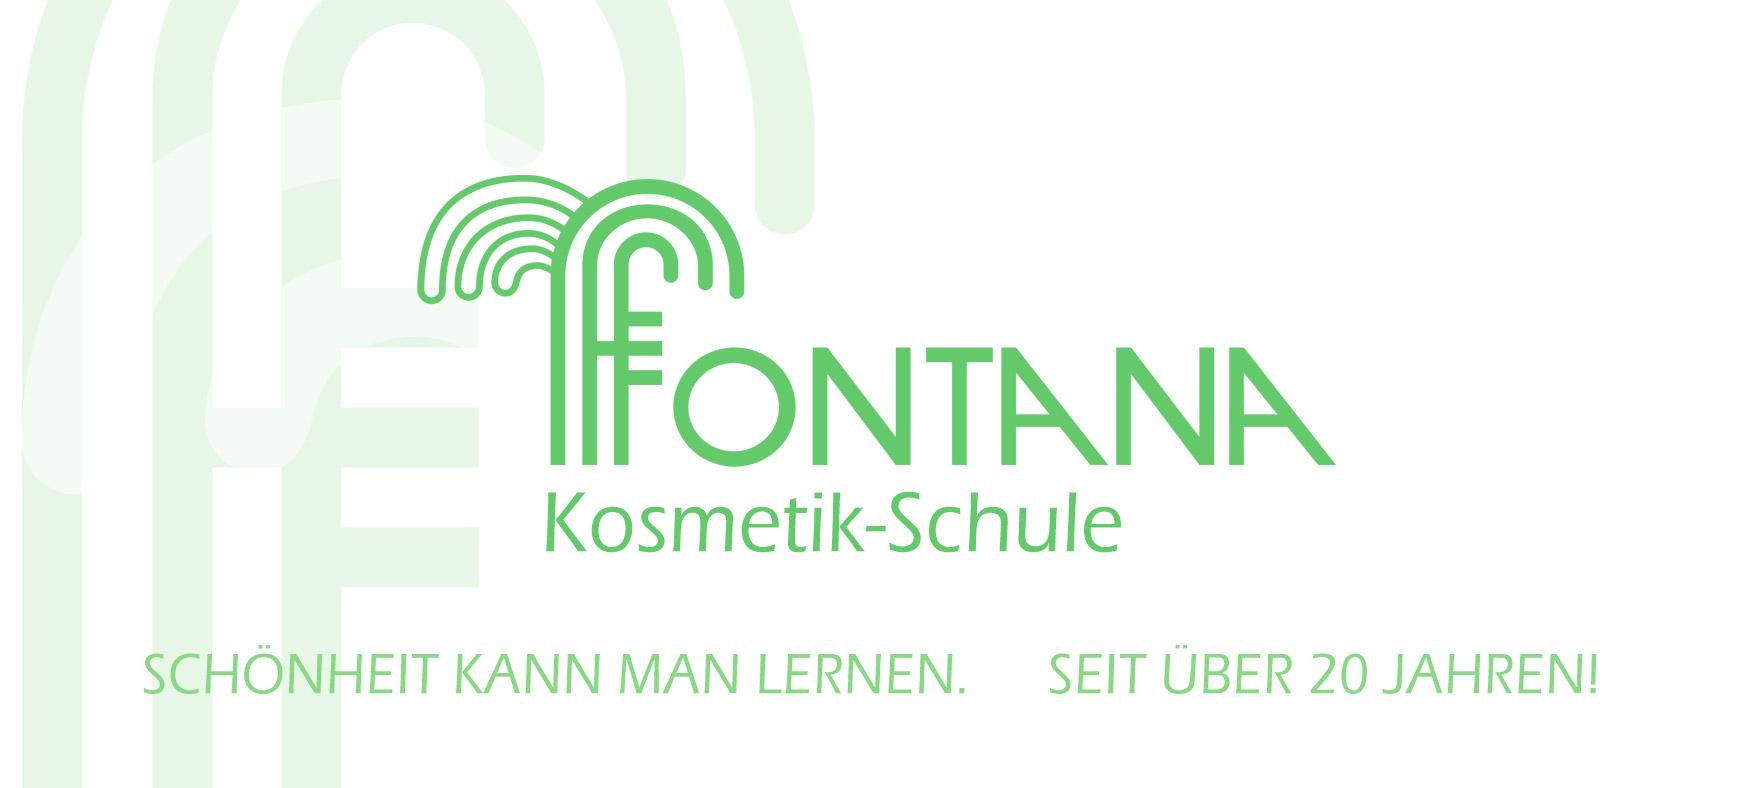 2020-Fontana_20jahreV2